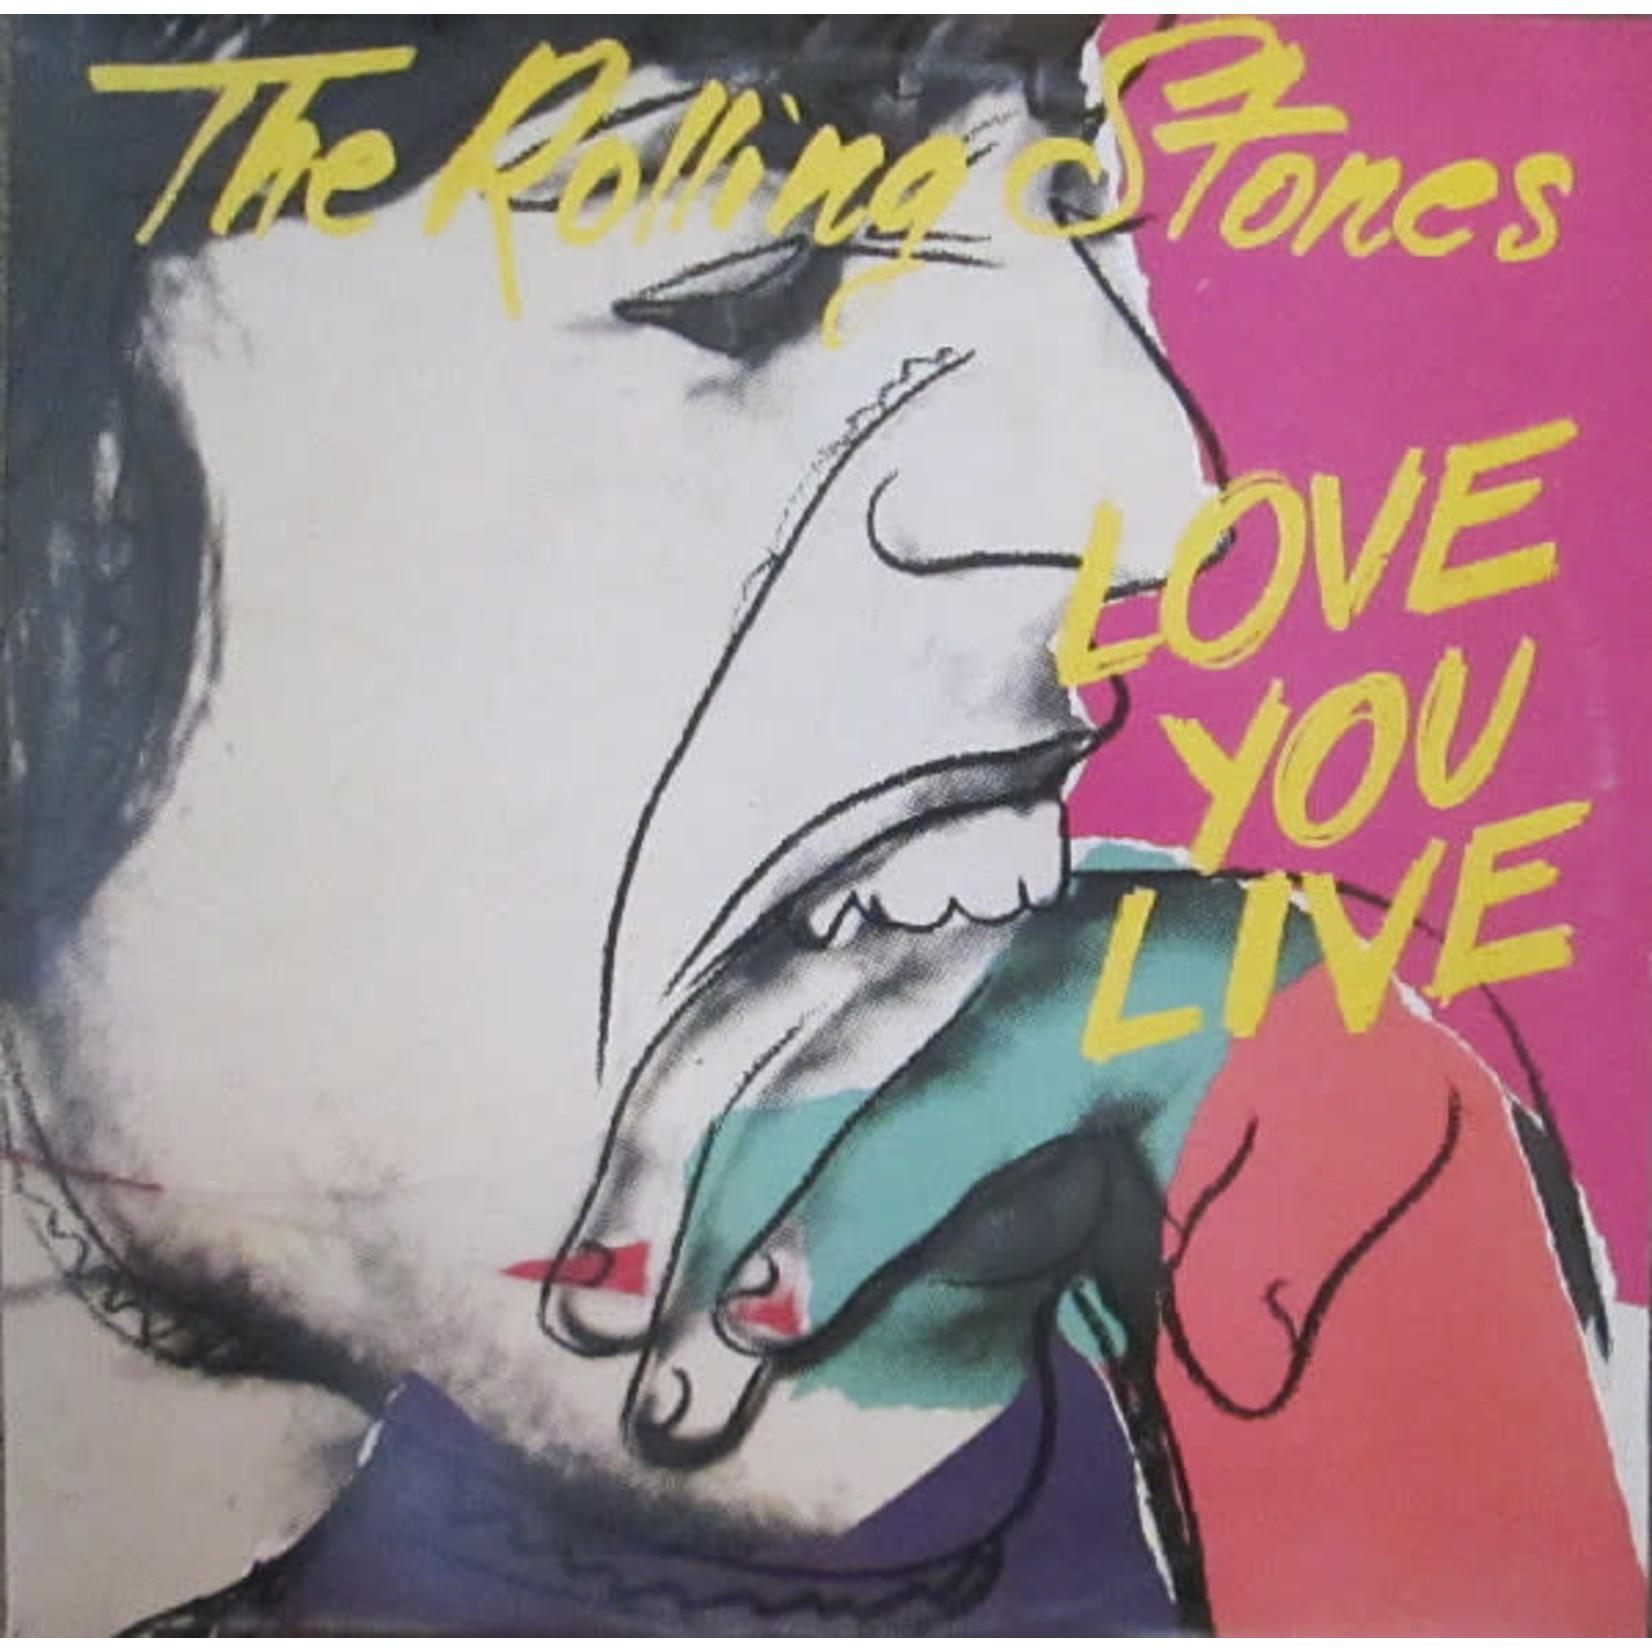 [Vintage] Rolling Stones: Love You Live